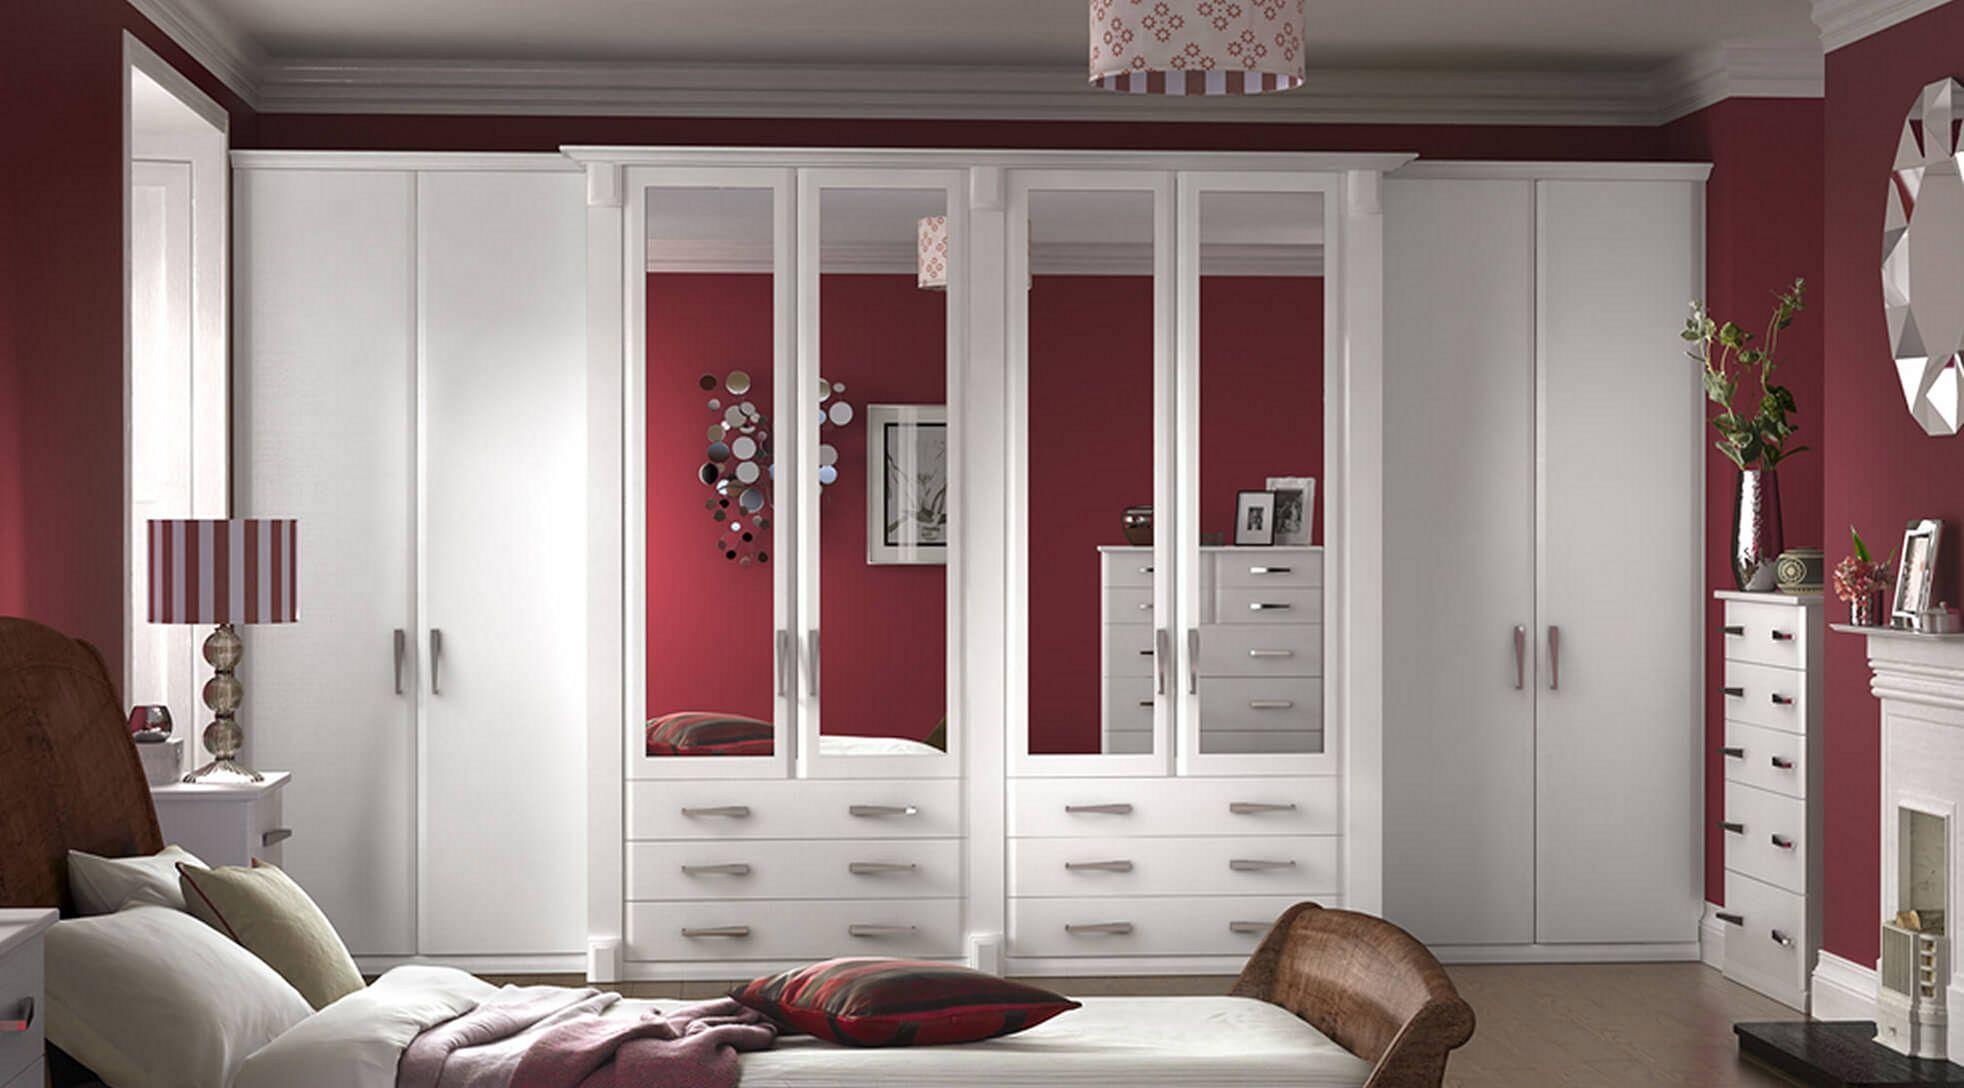 20 Fabulous Bedroom Cabinet Design That Look More Beautiful Teracee Bedroom Cabinets Cabinet Design Large Living Room Furniture